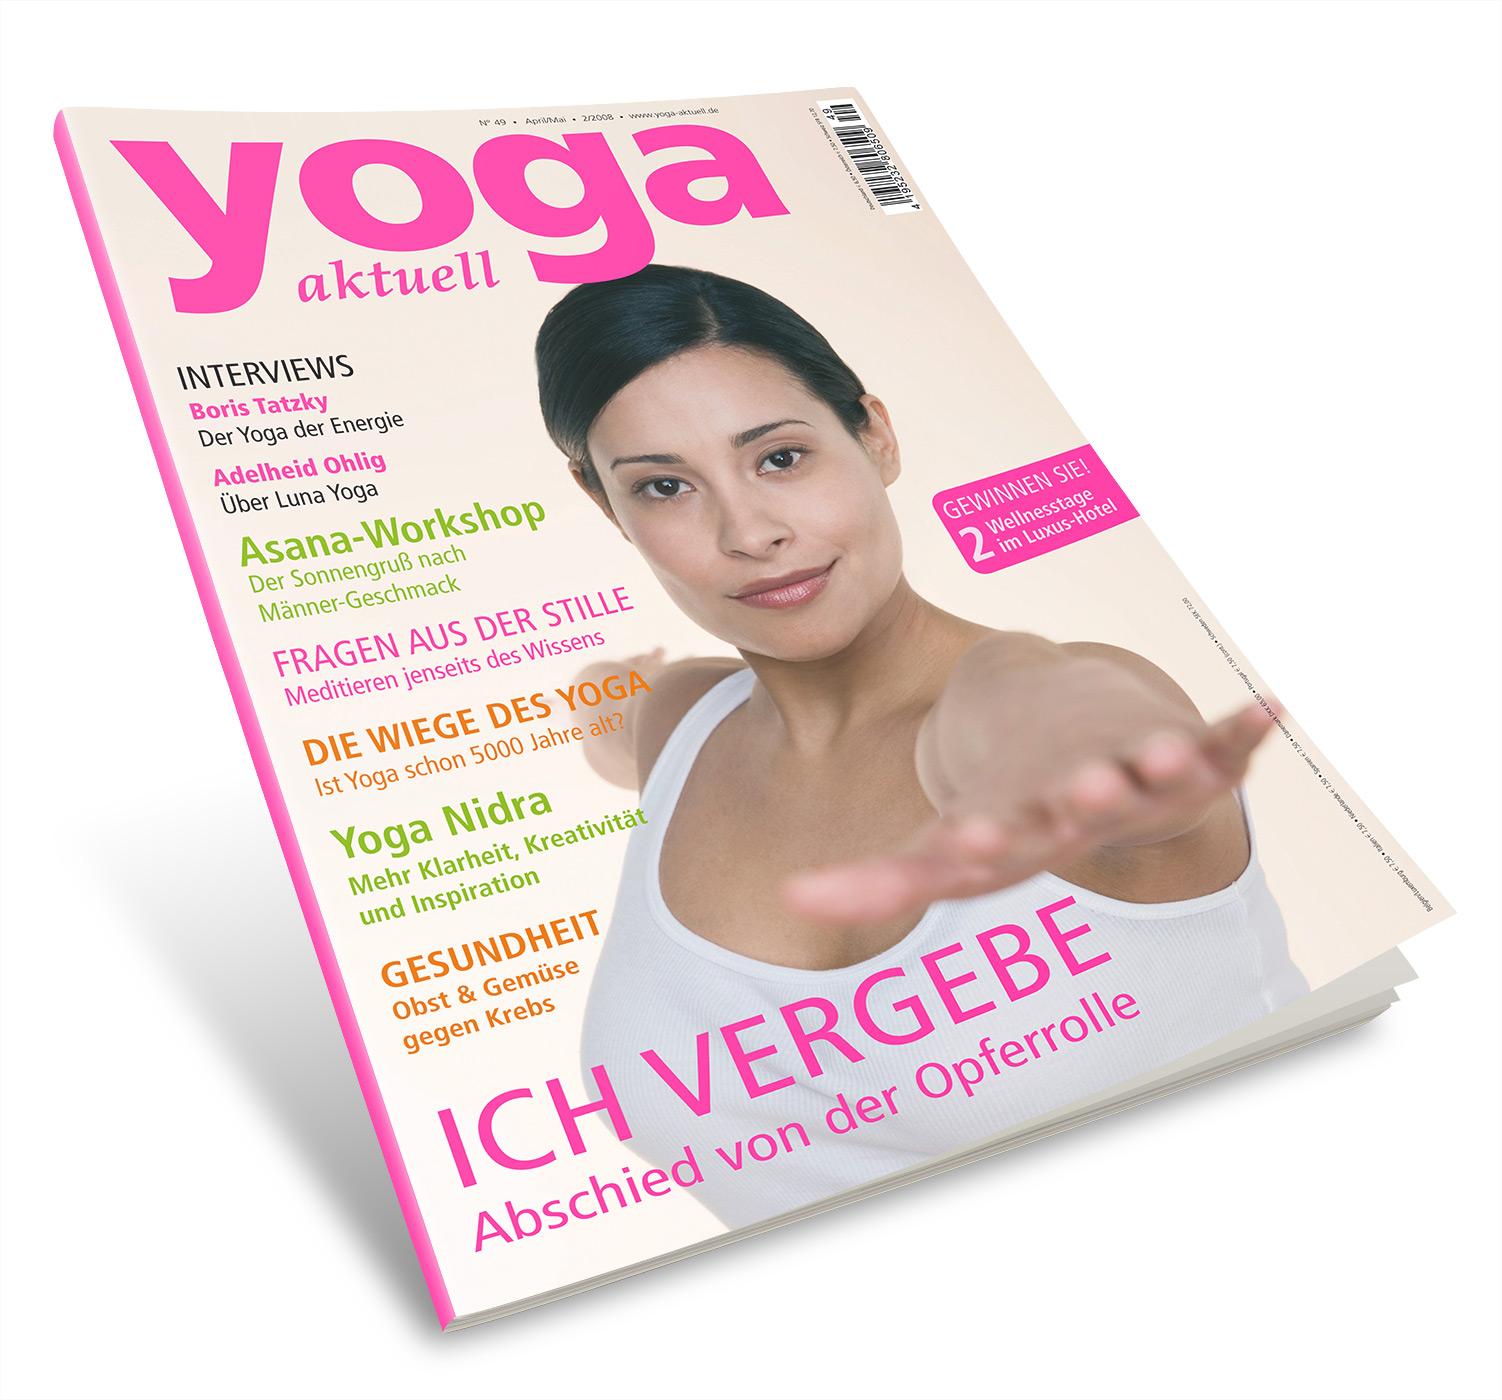 Yoga Aktuell 49 - 02/2008